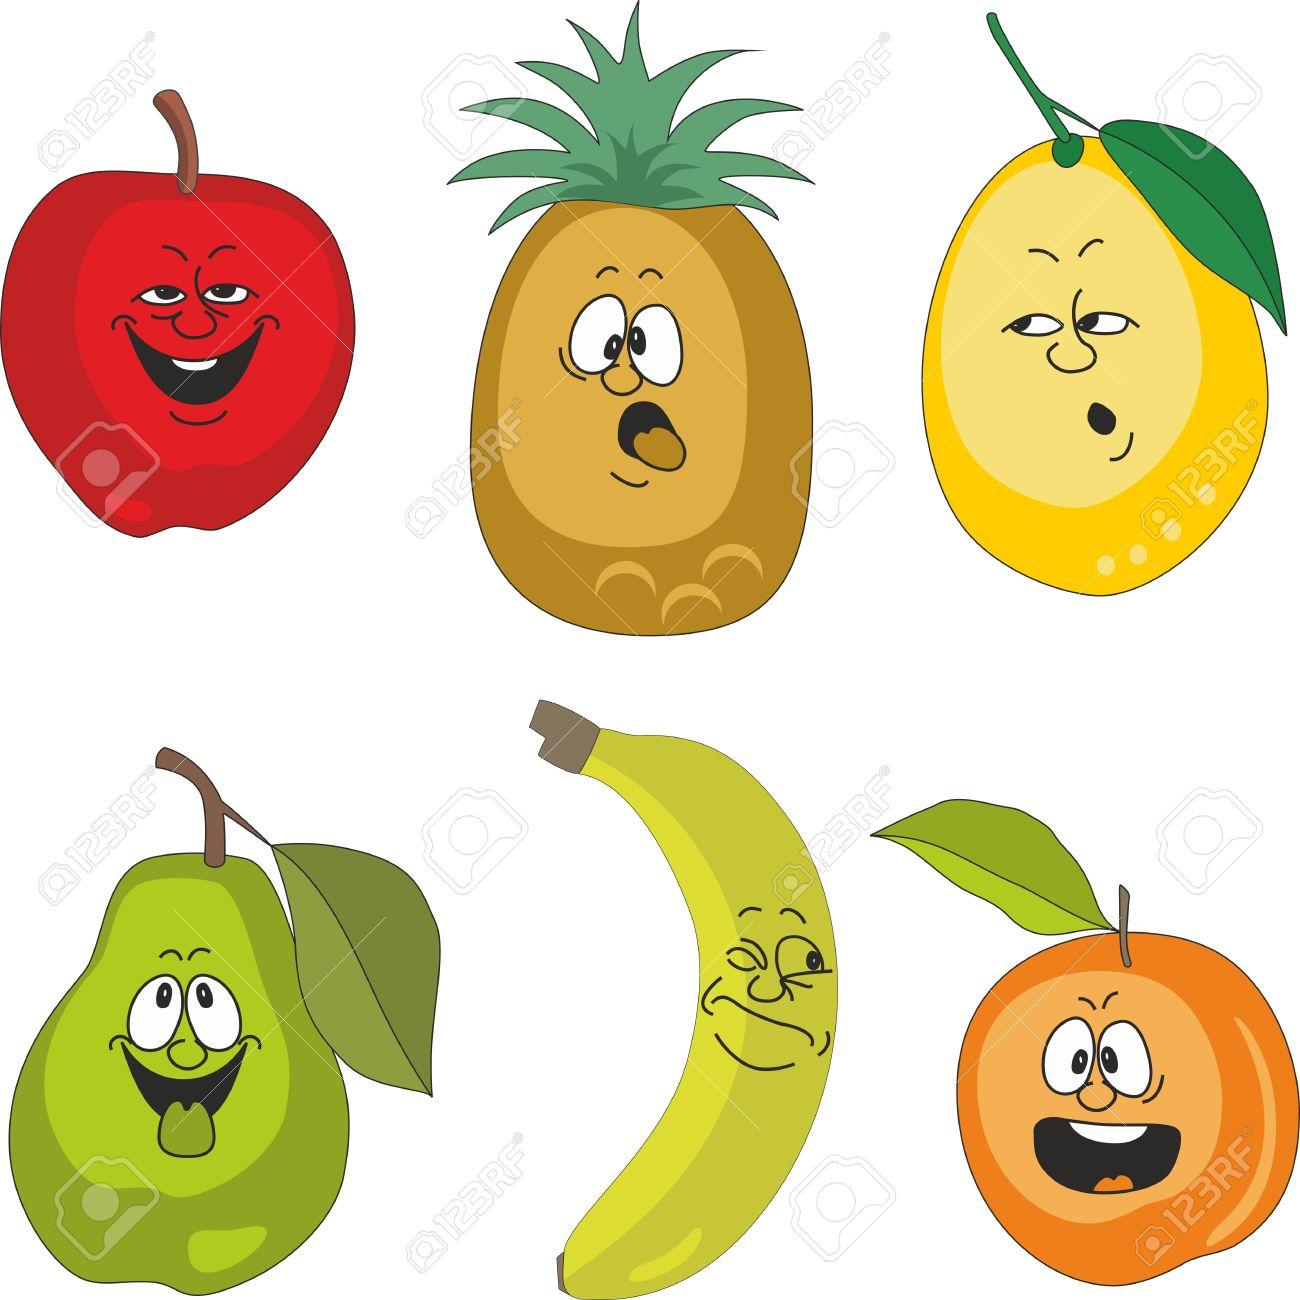 Vector. Emotion cartoon fruits set 010 Stock Vector - 22007893